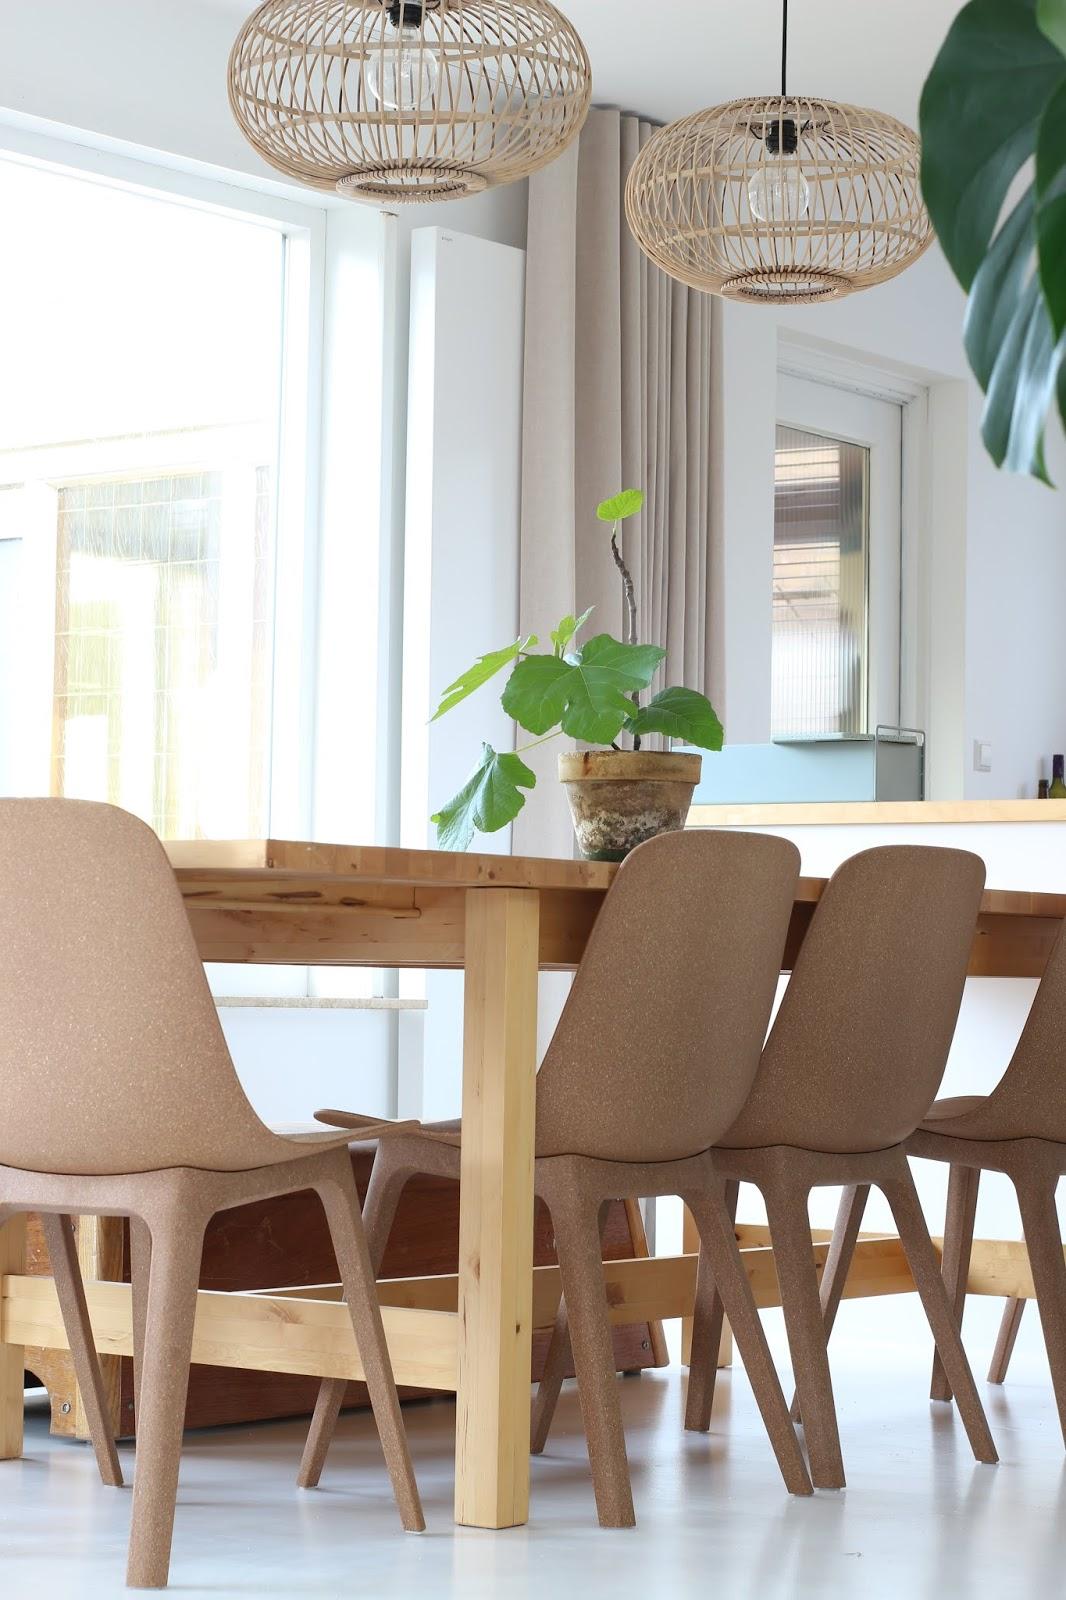 Ikea Eettafel 4 Stoelen.Vintage Eetkamertafel En Ikea Odger Stoelen